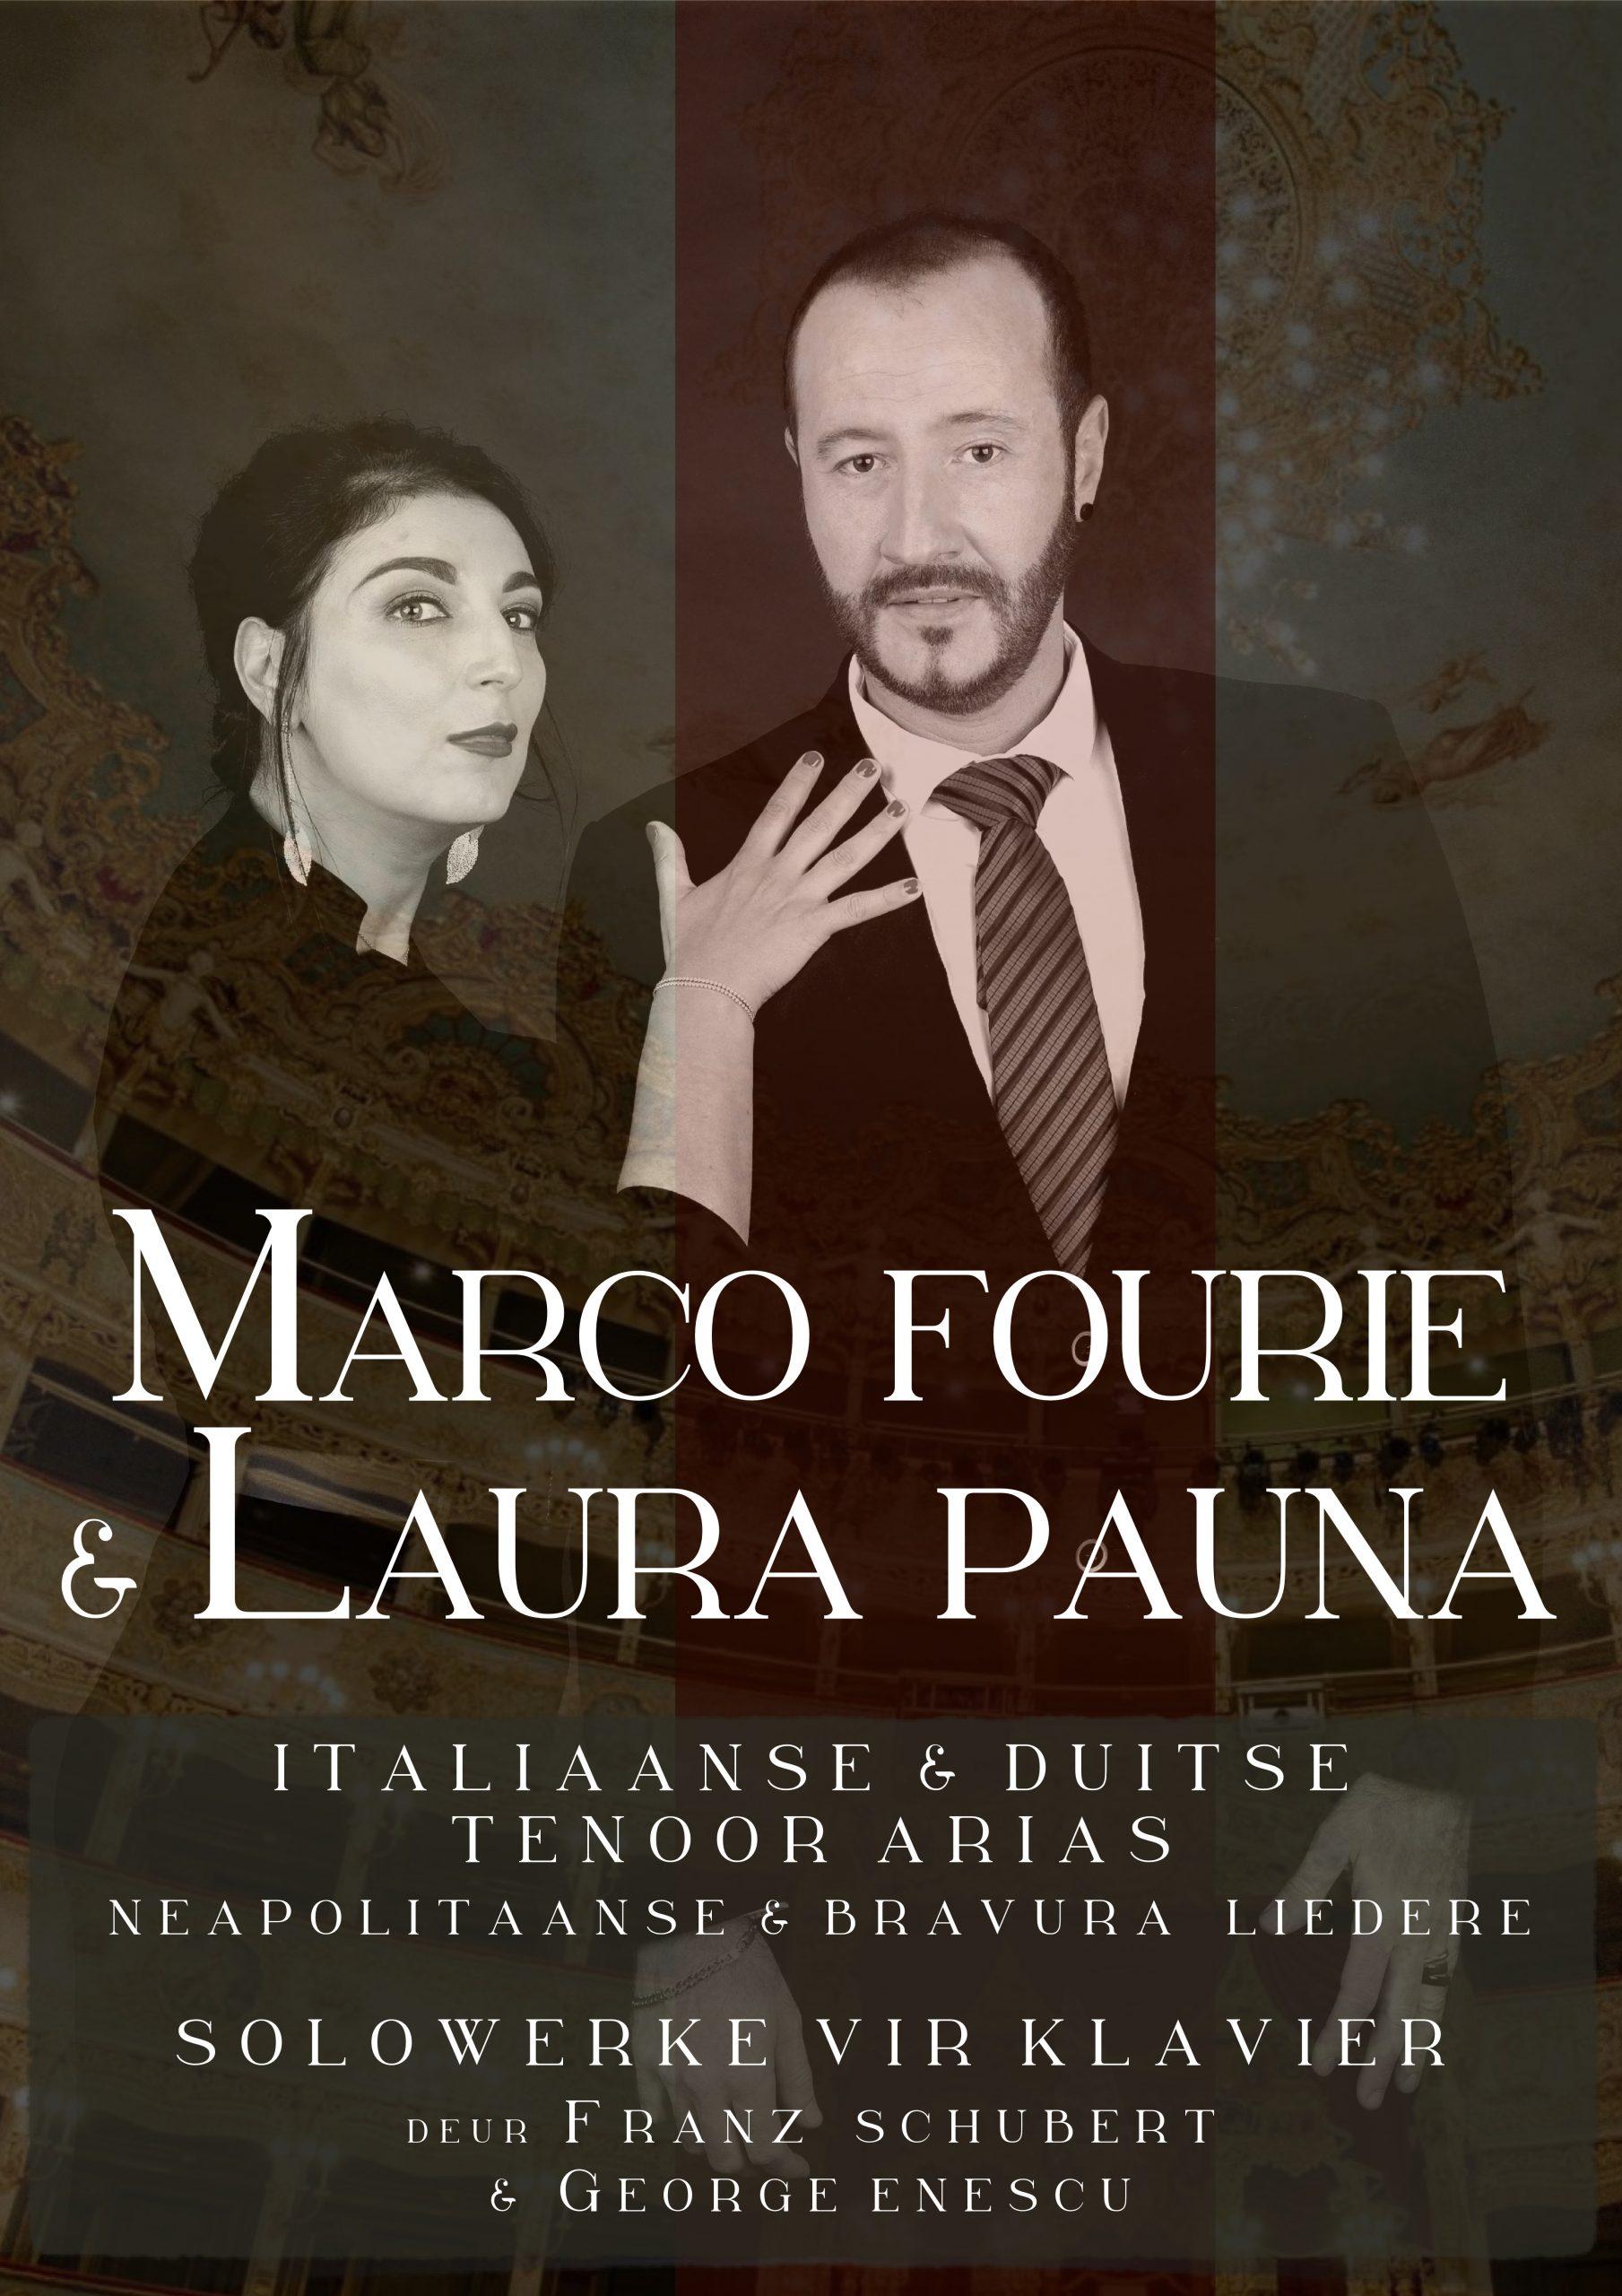 Klassieke uitvoering met Marco Fourie & Laura Pauna – Sang en Klavier